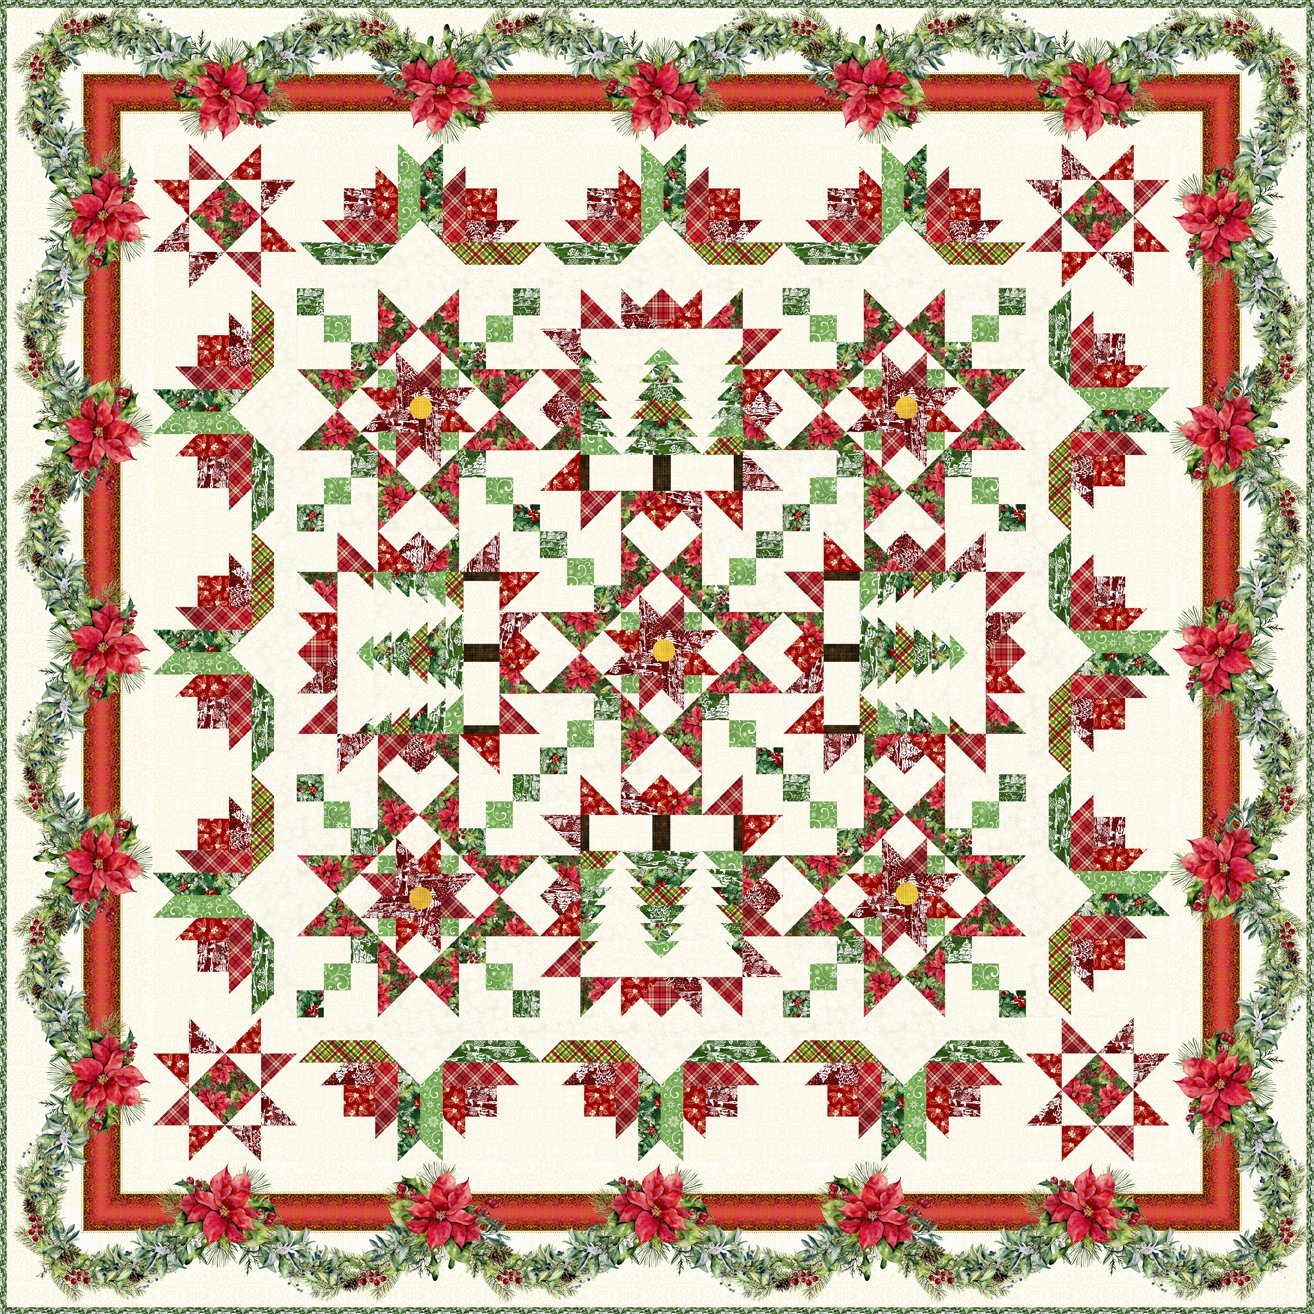 A Poinsettia Winter Quilt KIT